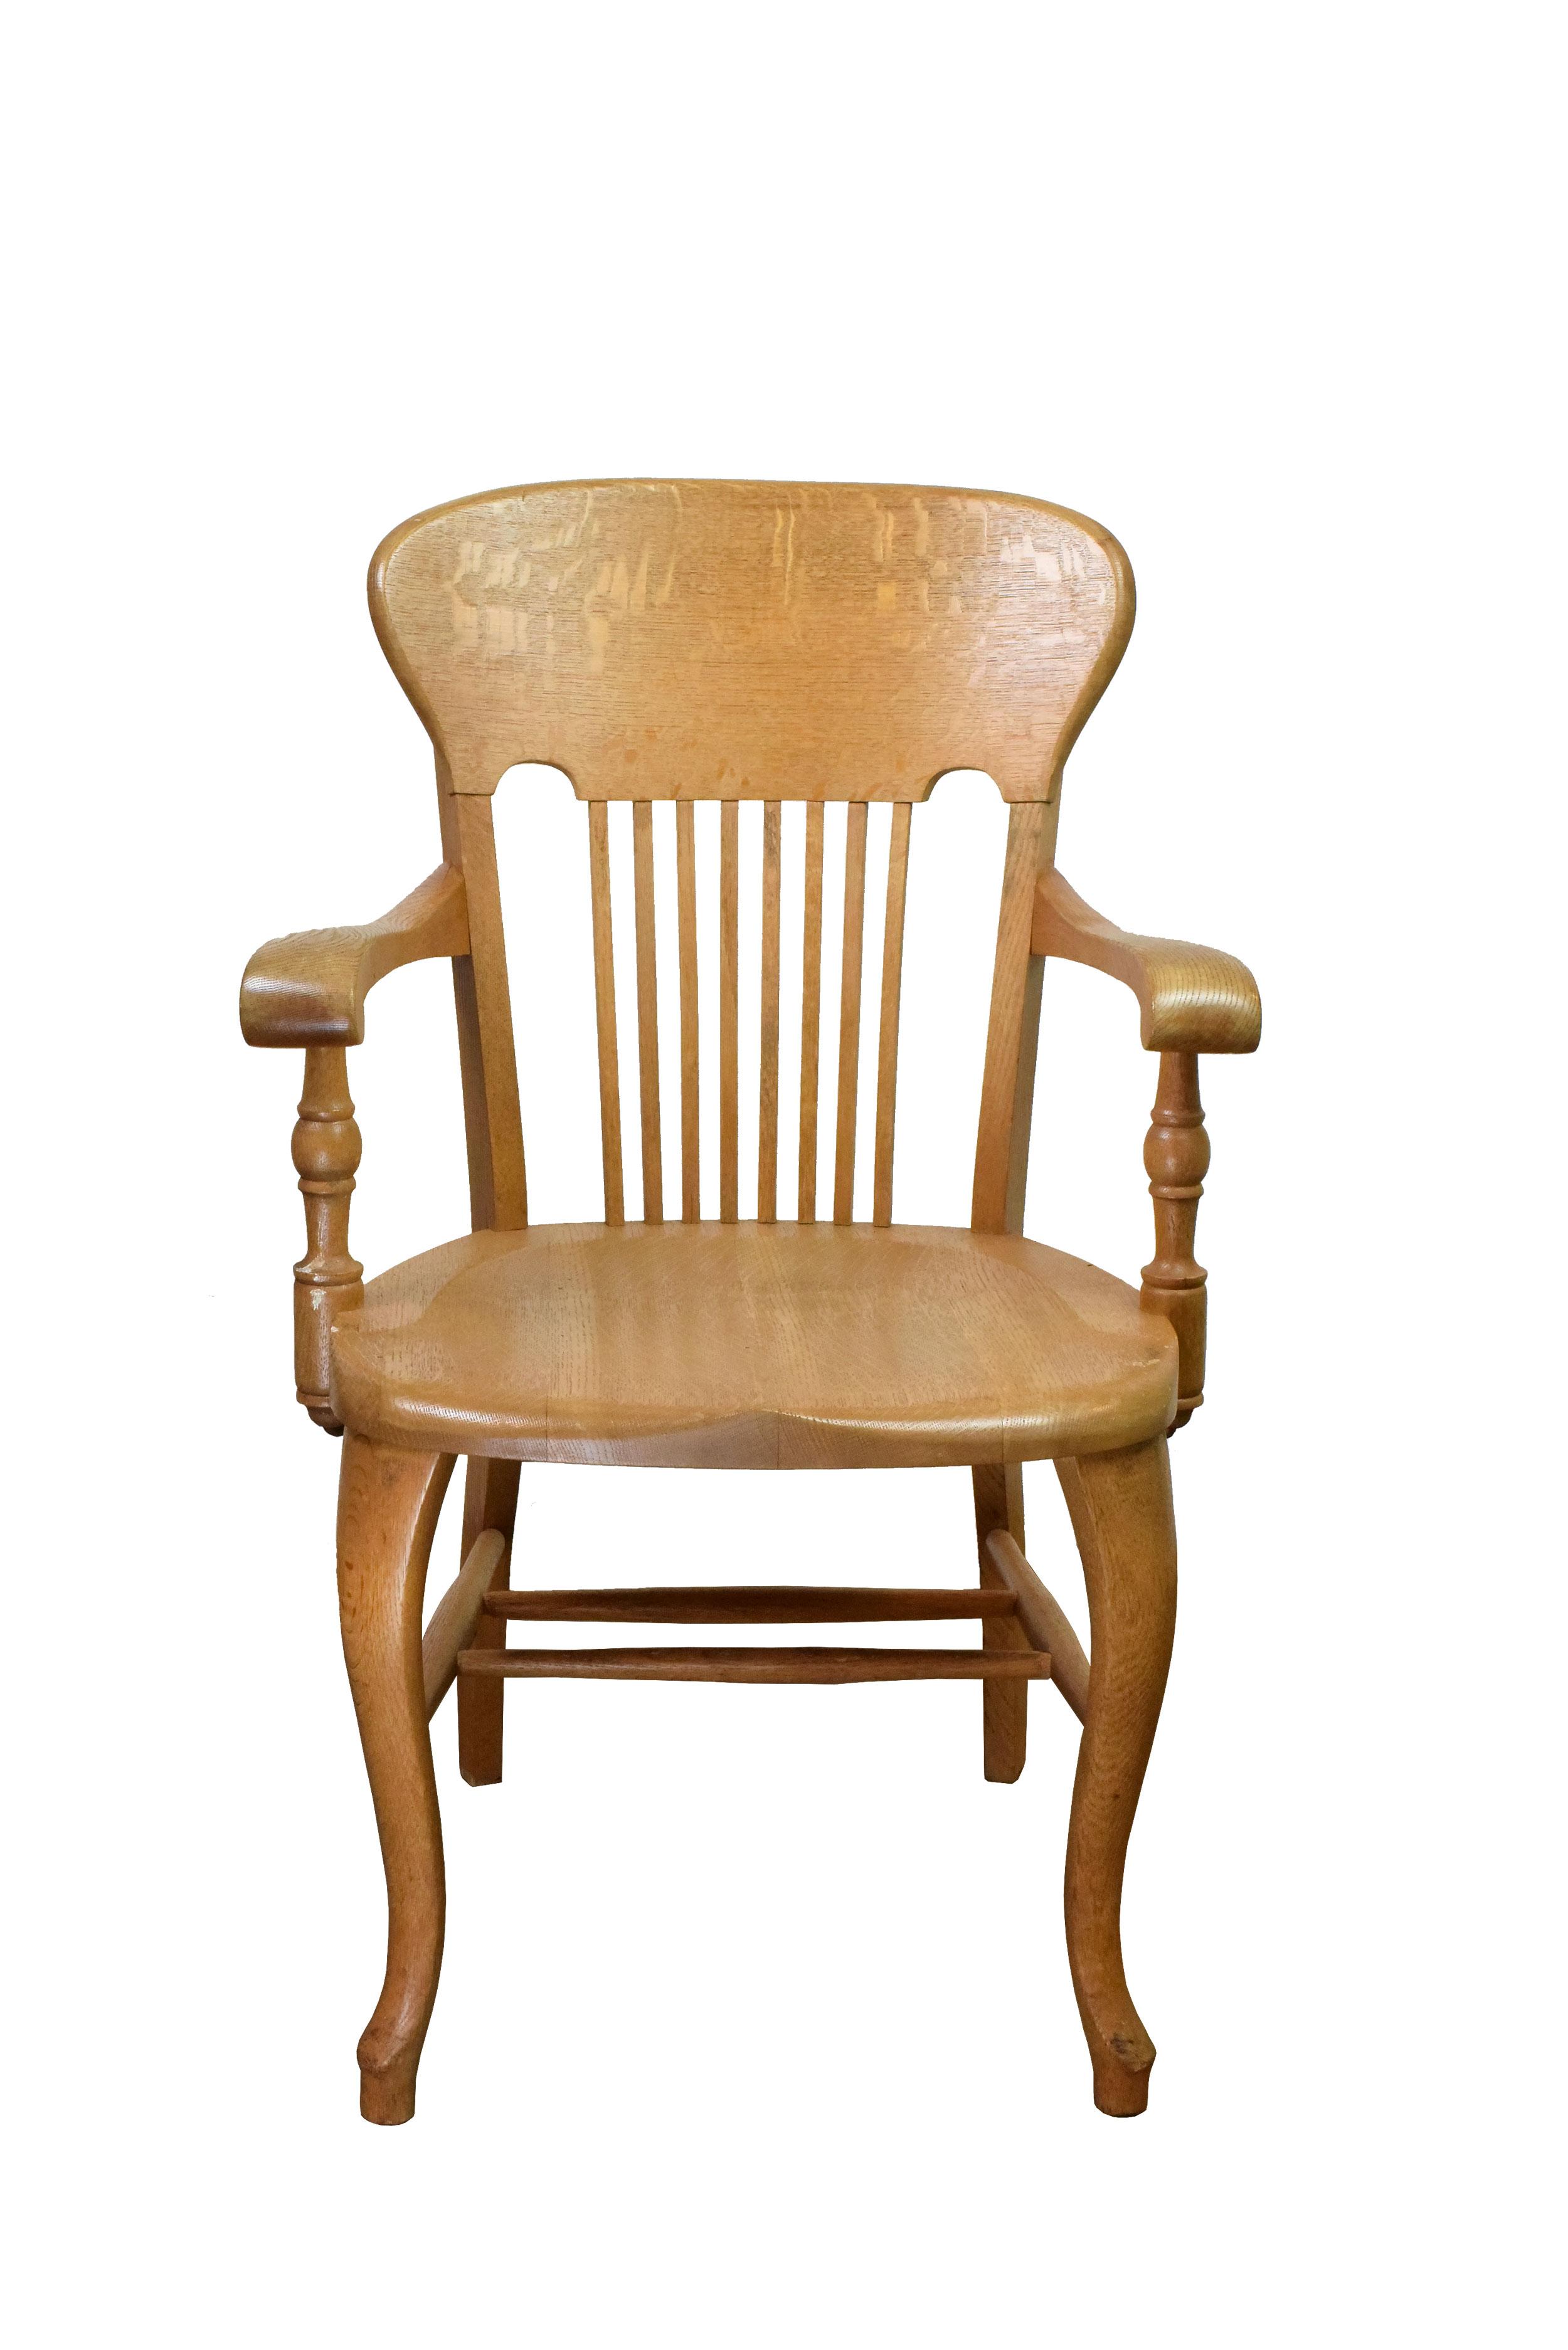 47057-quartersawn-courtroom-chair-single.jpg